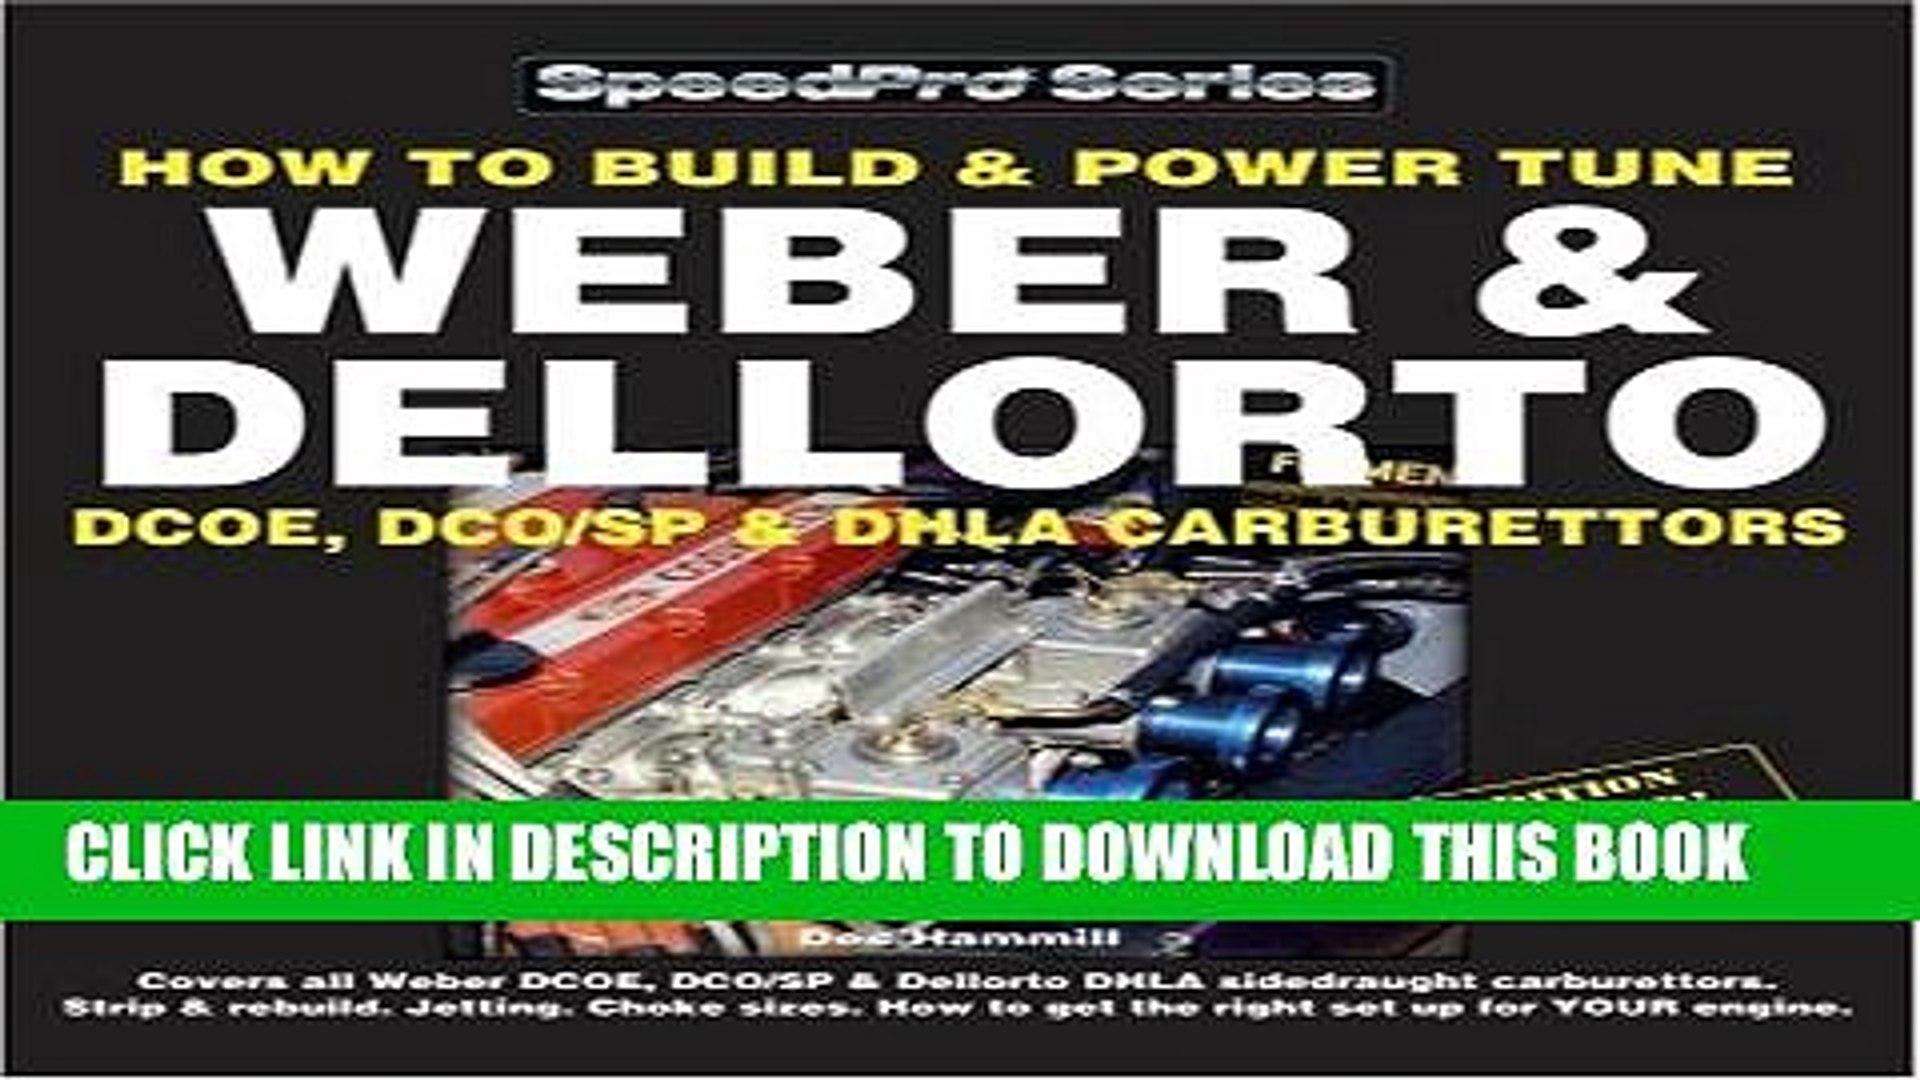 [Read PDF] How to Build Power Tune Weber Dellorto DCOE DHLA Carburettors  (SpeedPro Series)